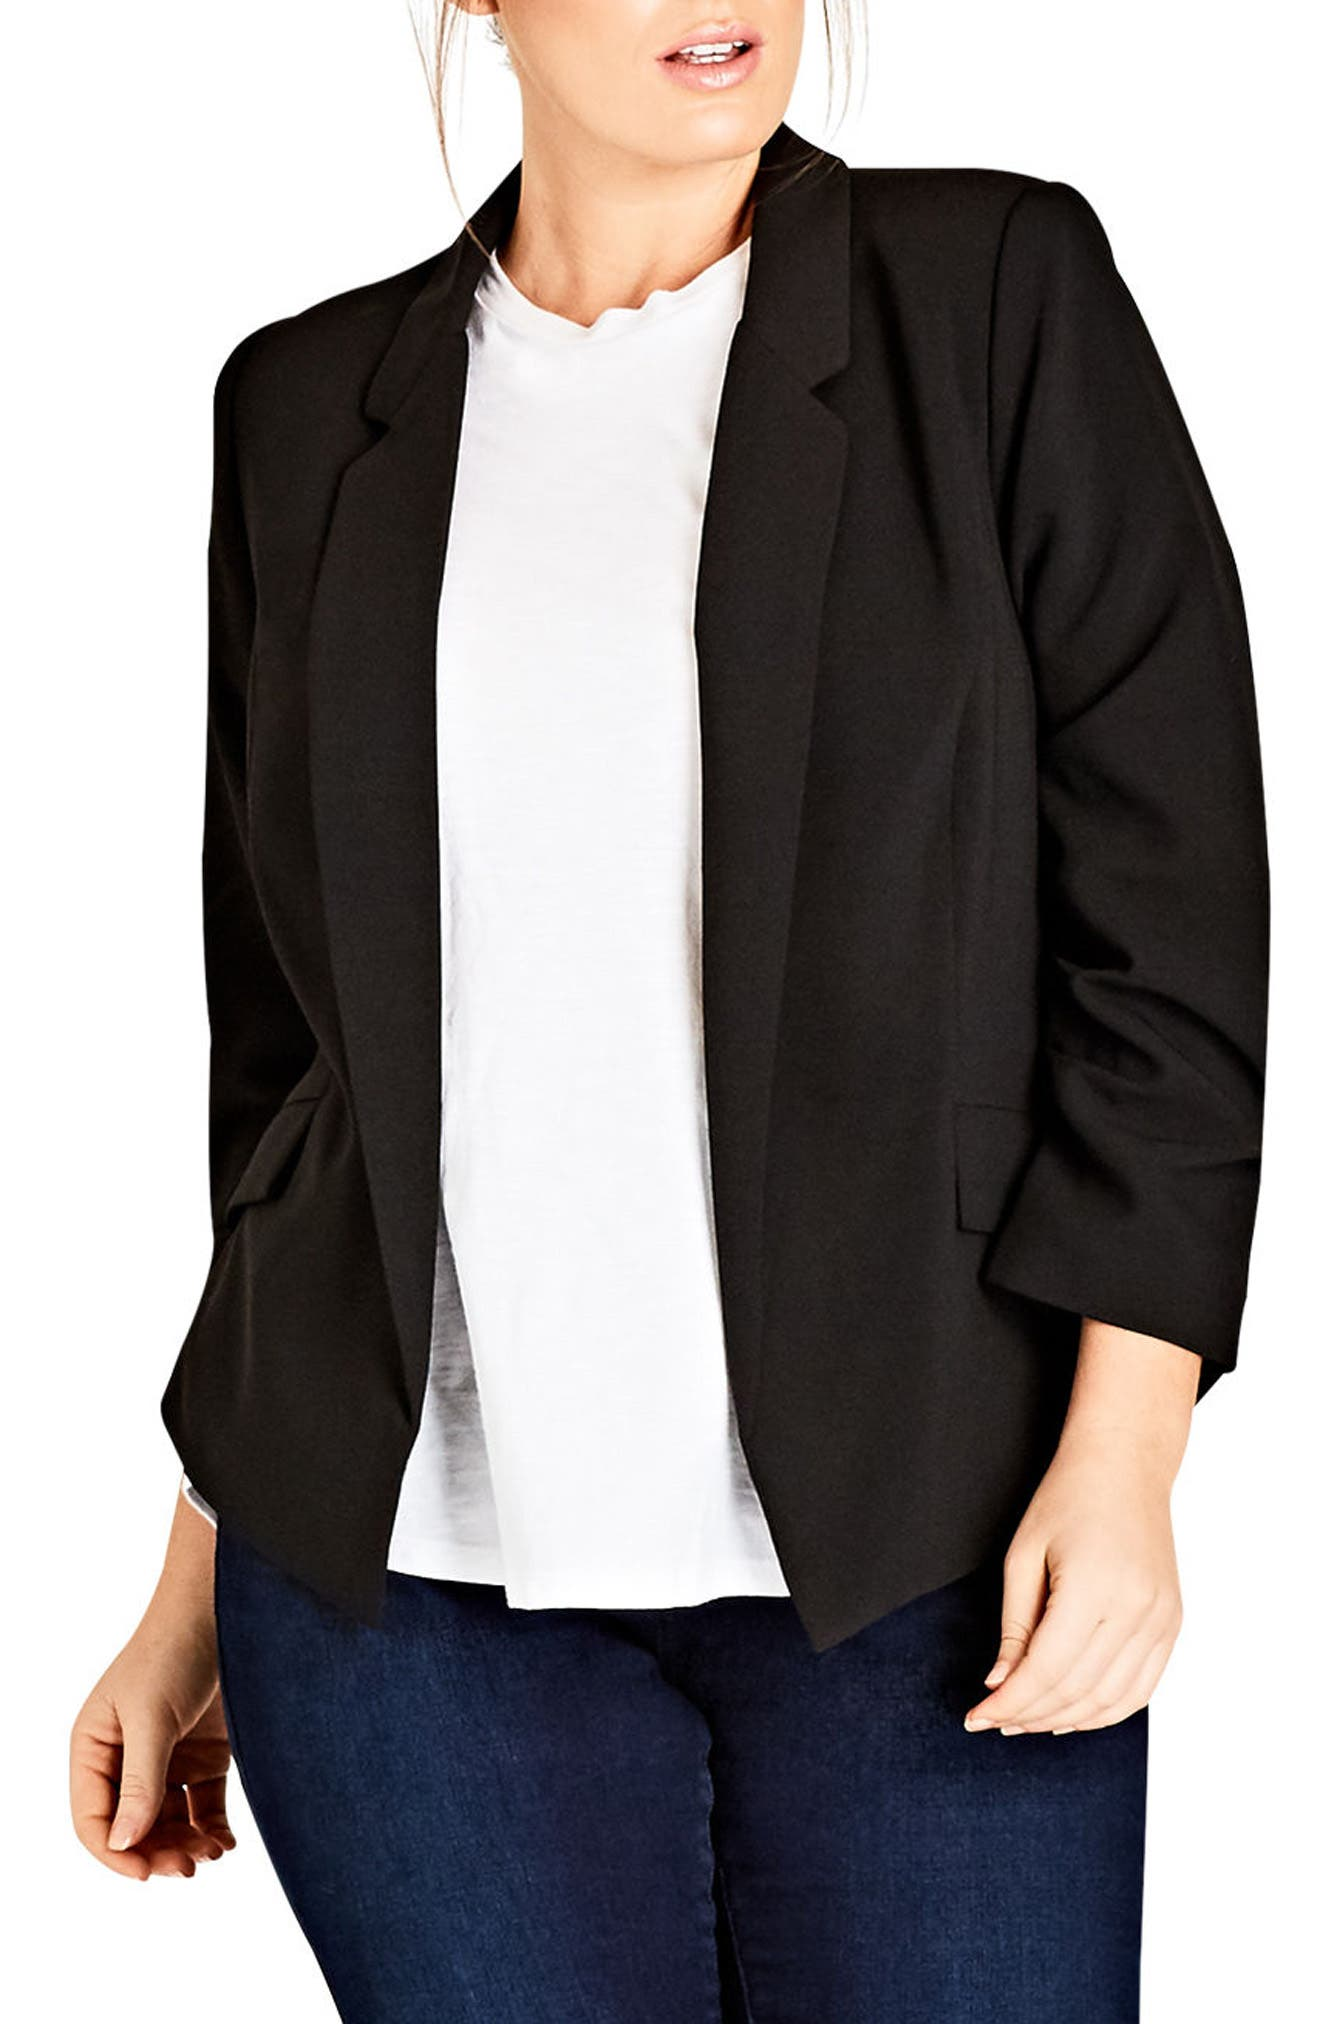 Main Image - City Chic Classy Lady Jacket (Plus Size)